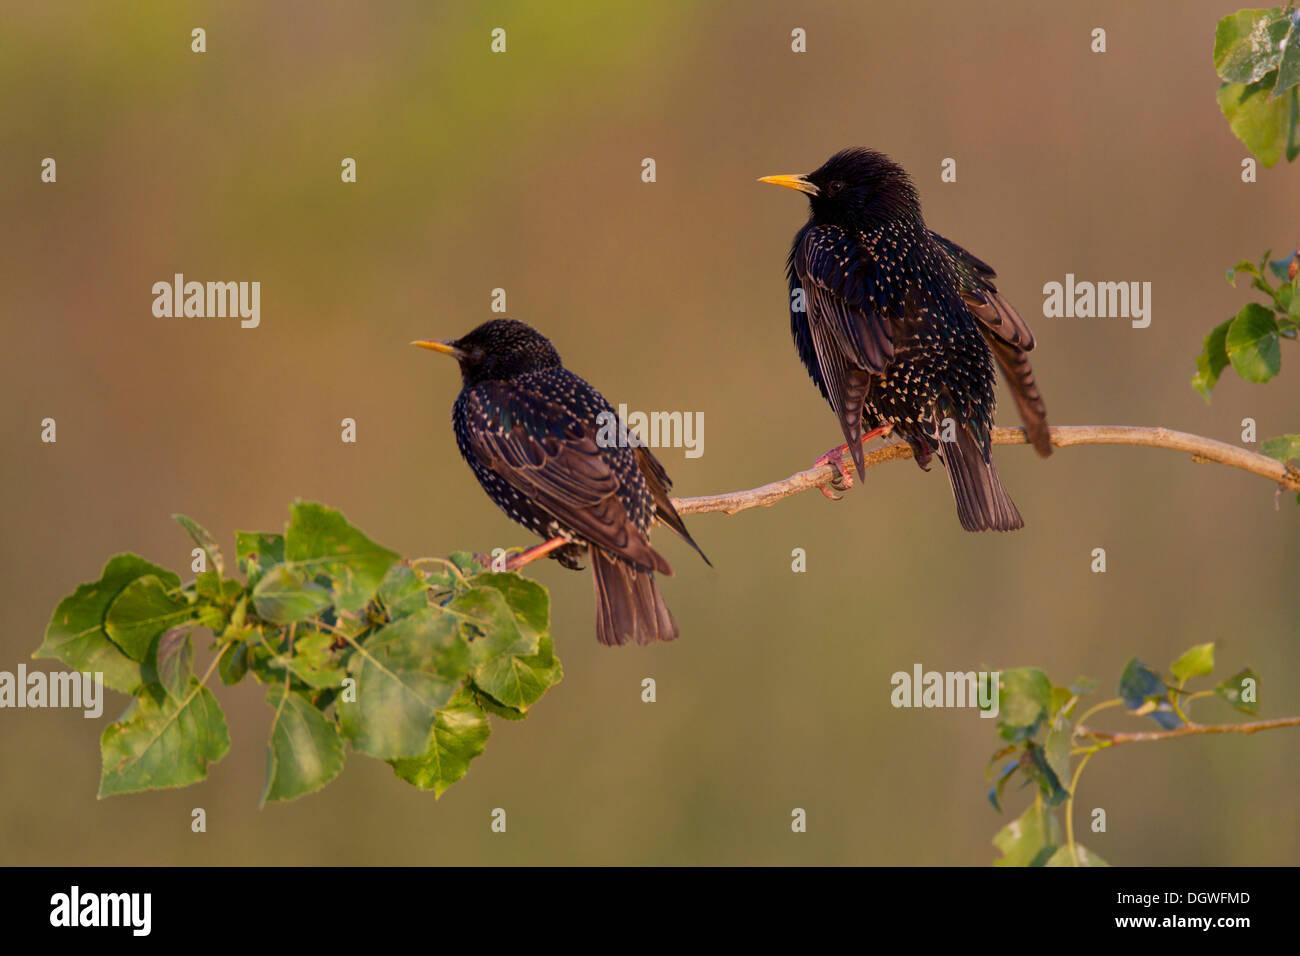 Starlings (Sturnus vulgaris) during courtship, North Bulgaria, Bulgaria - Stock Image